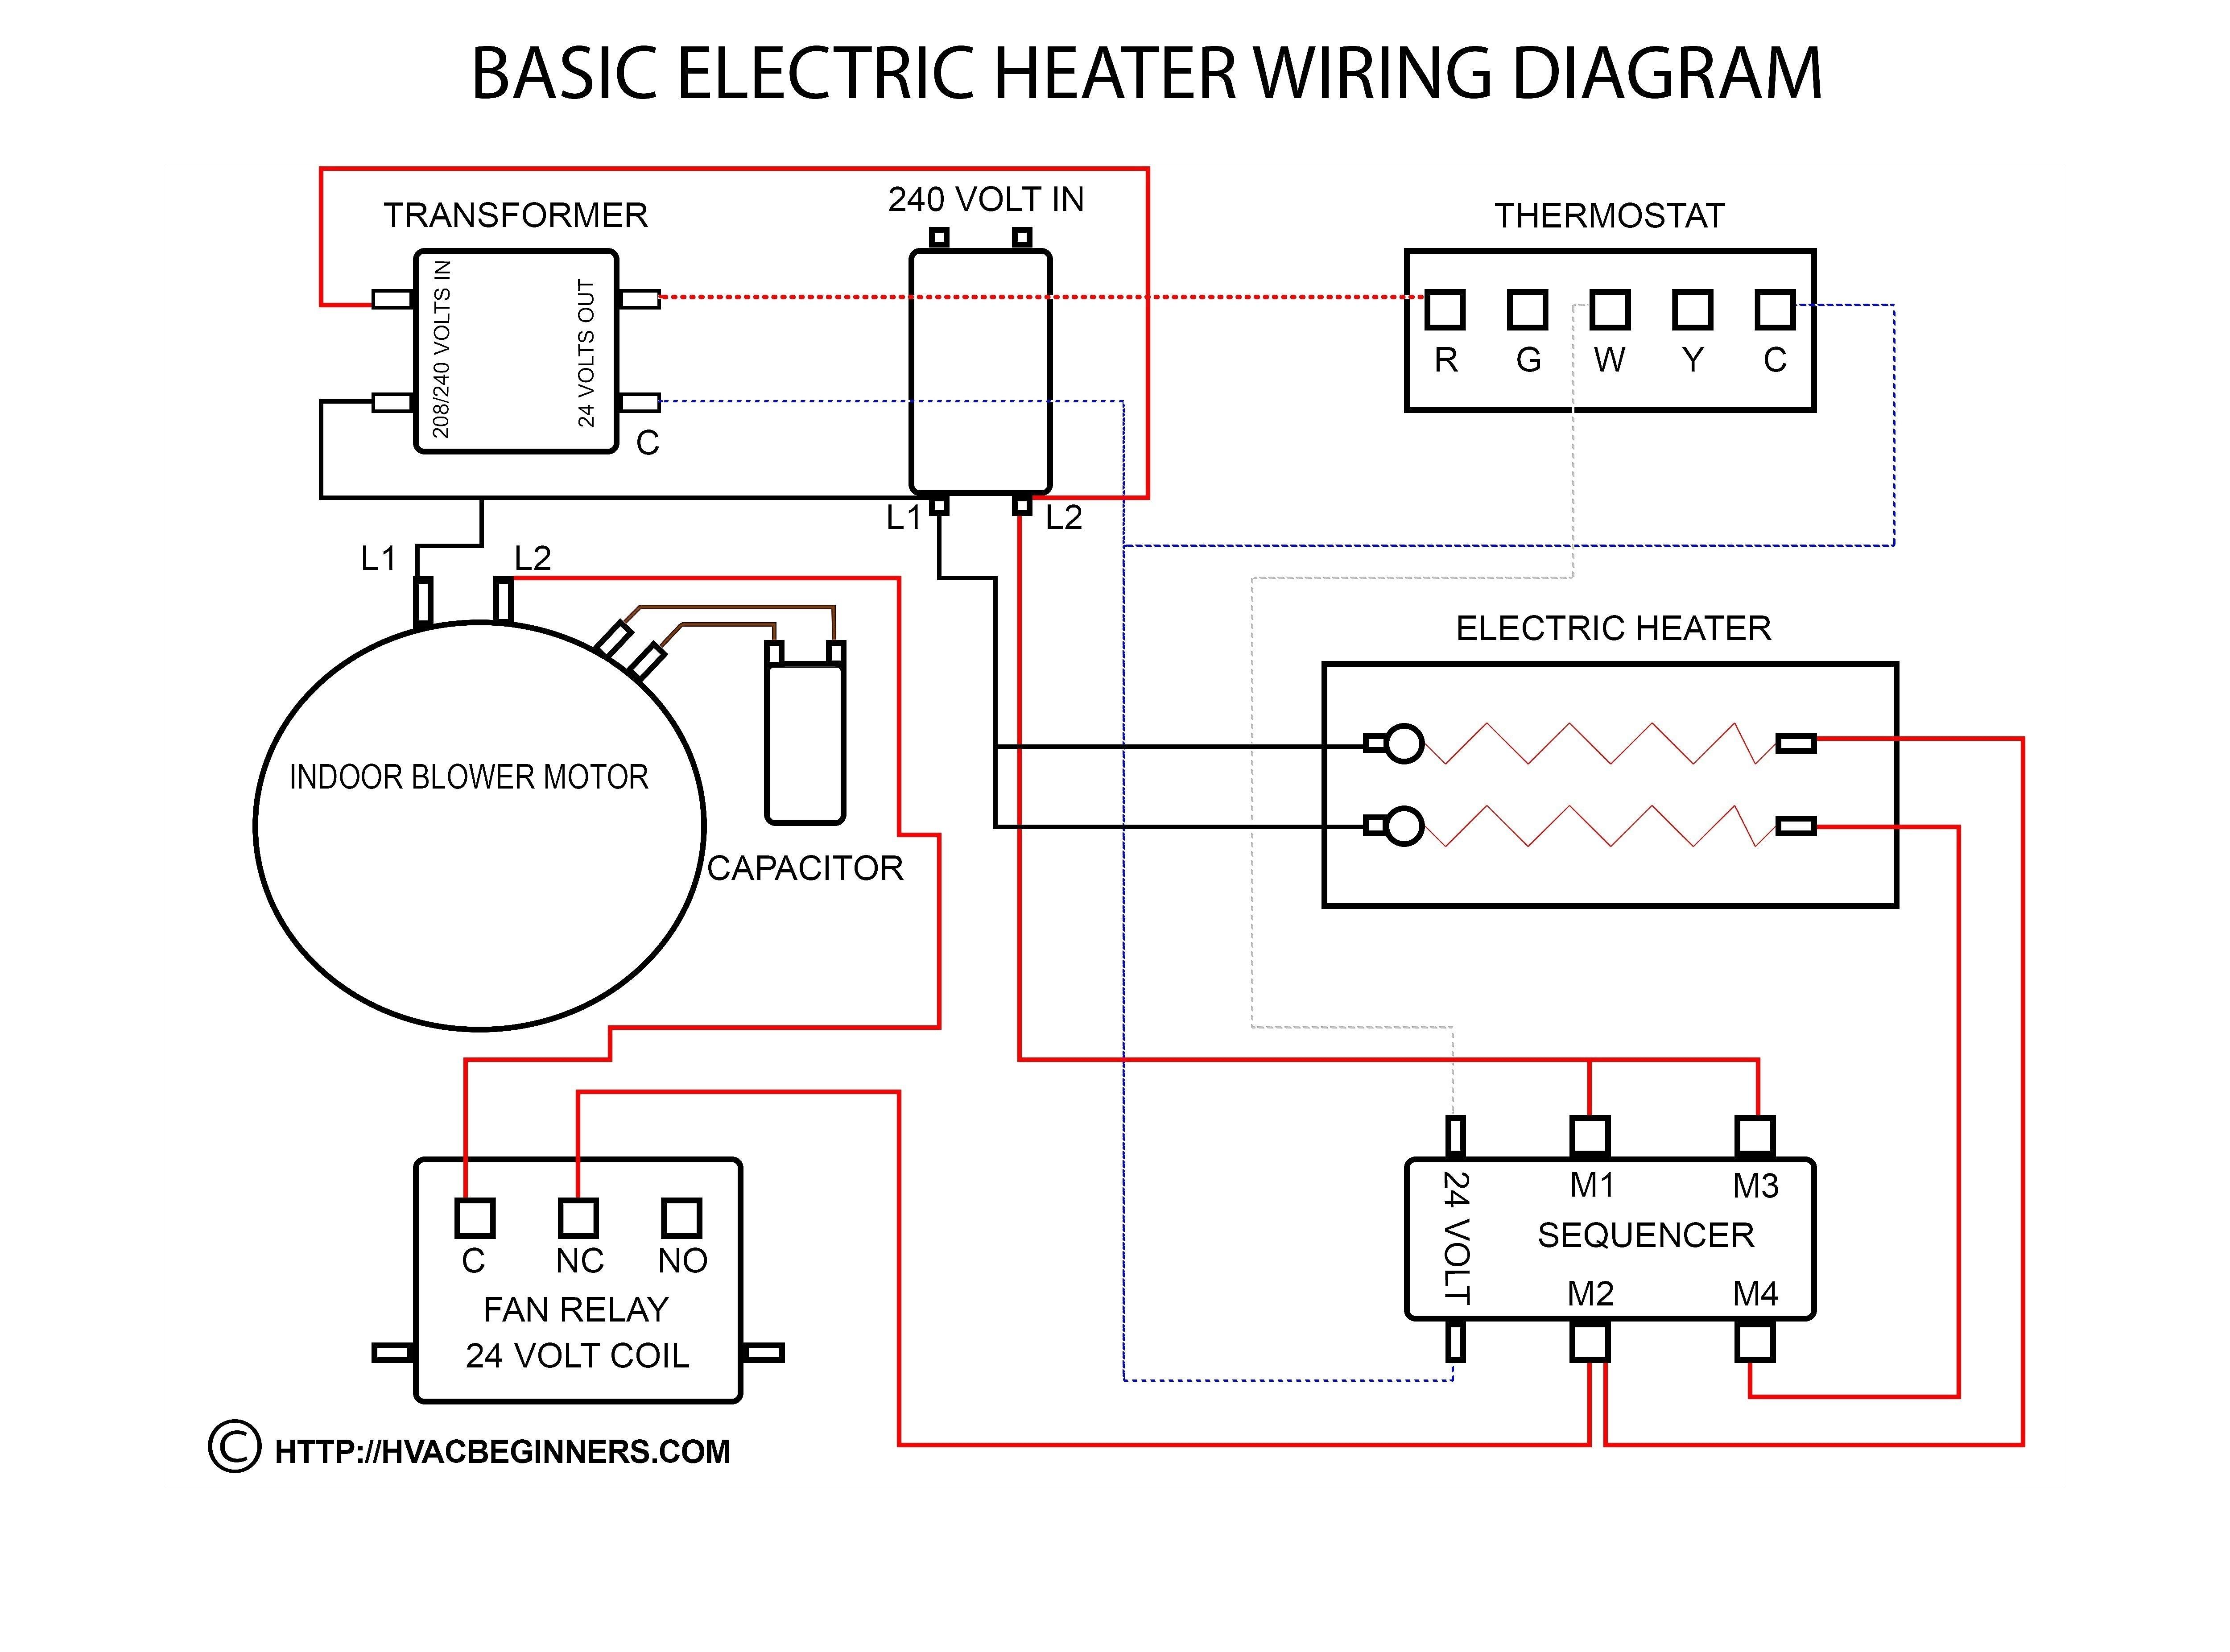 furnace transformer wiring diagram Collection-Hvac Transformer Wiring Diagram Fresh Home Hvac Wiring Diagram Valid Wiring Diagram Hvac Save Hvac Wiring 7-g